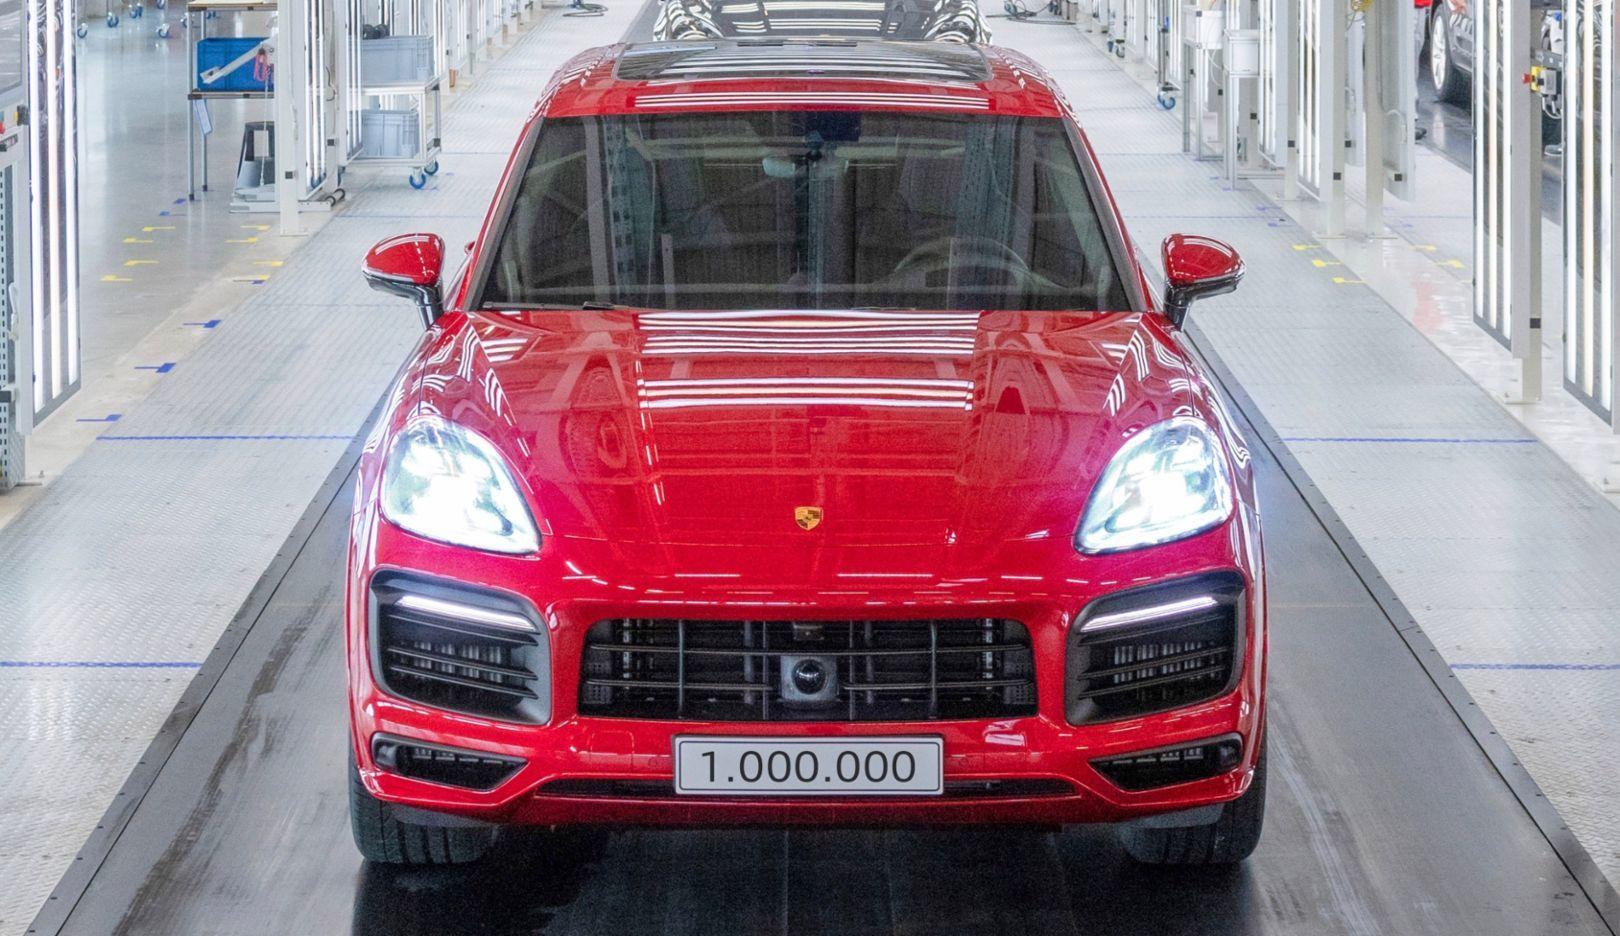 Cayenne: Το μοντέλο που έσωσε την Porsche από την πτώχευση [pics]